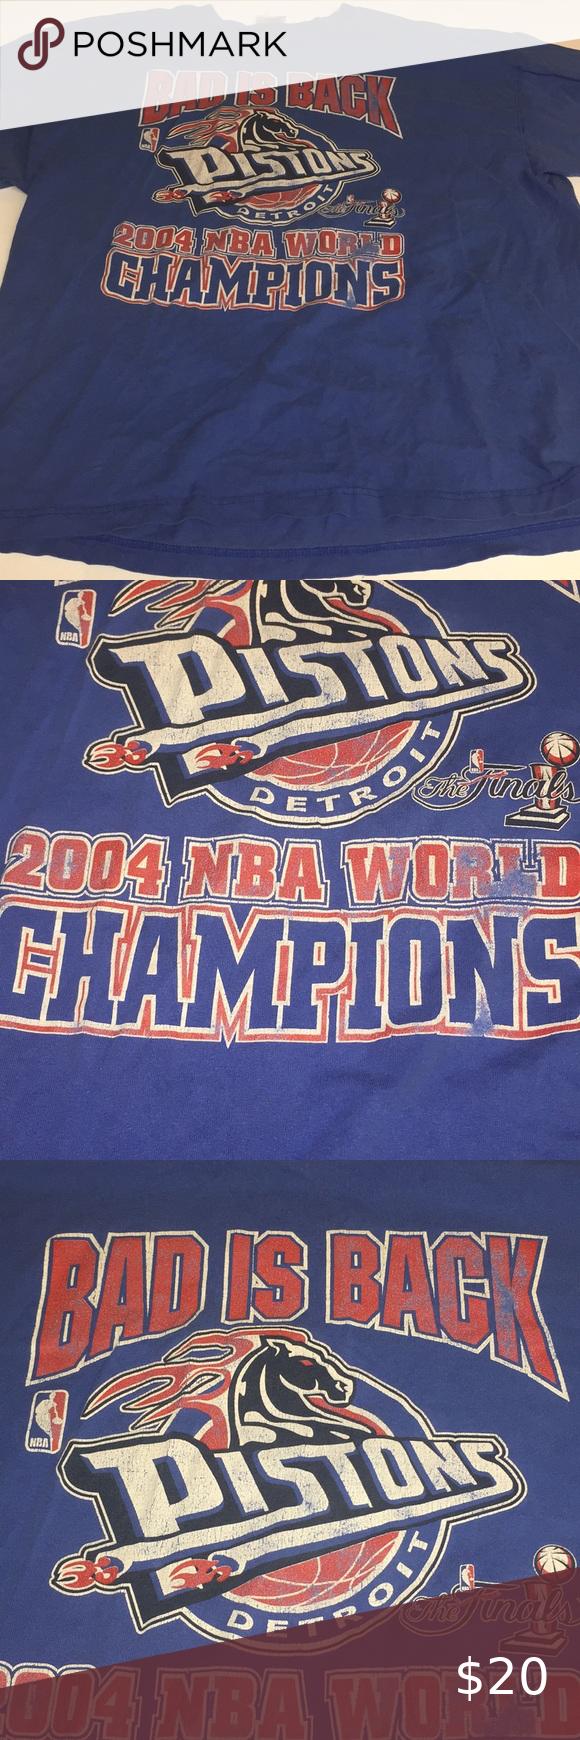 Detroit Pistons 2004 Nba World Champions T Shirt In 2020 Vintage Shirts Detroit Pistons T Shirt